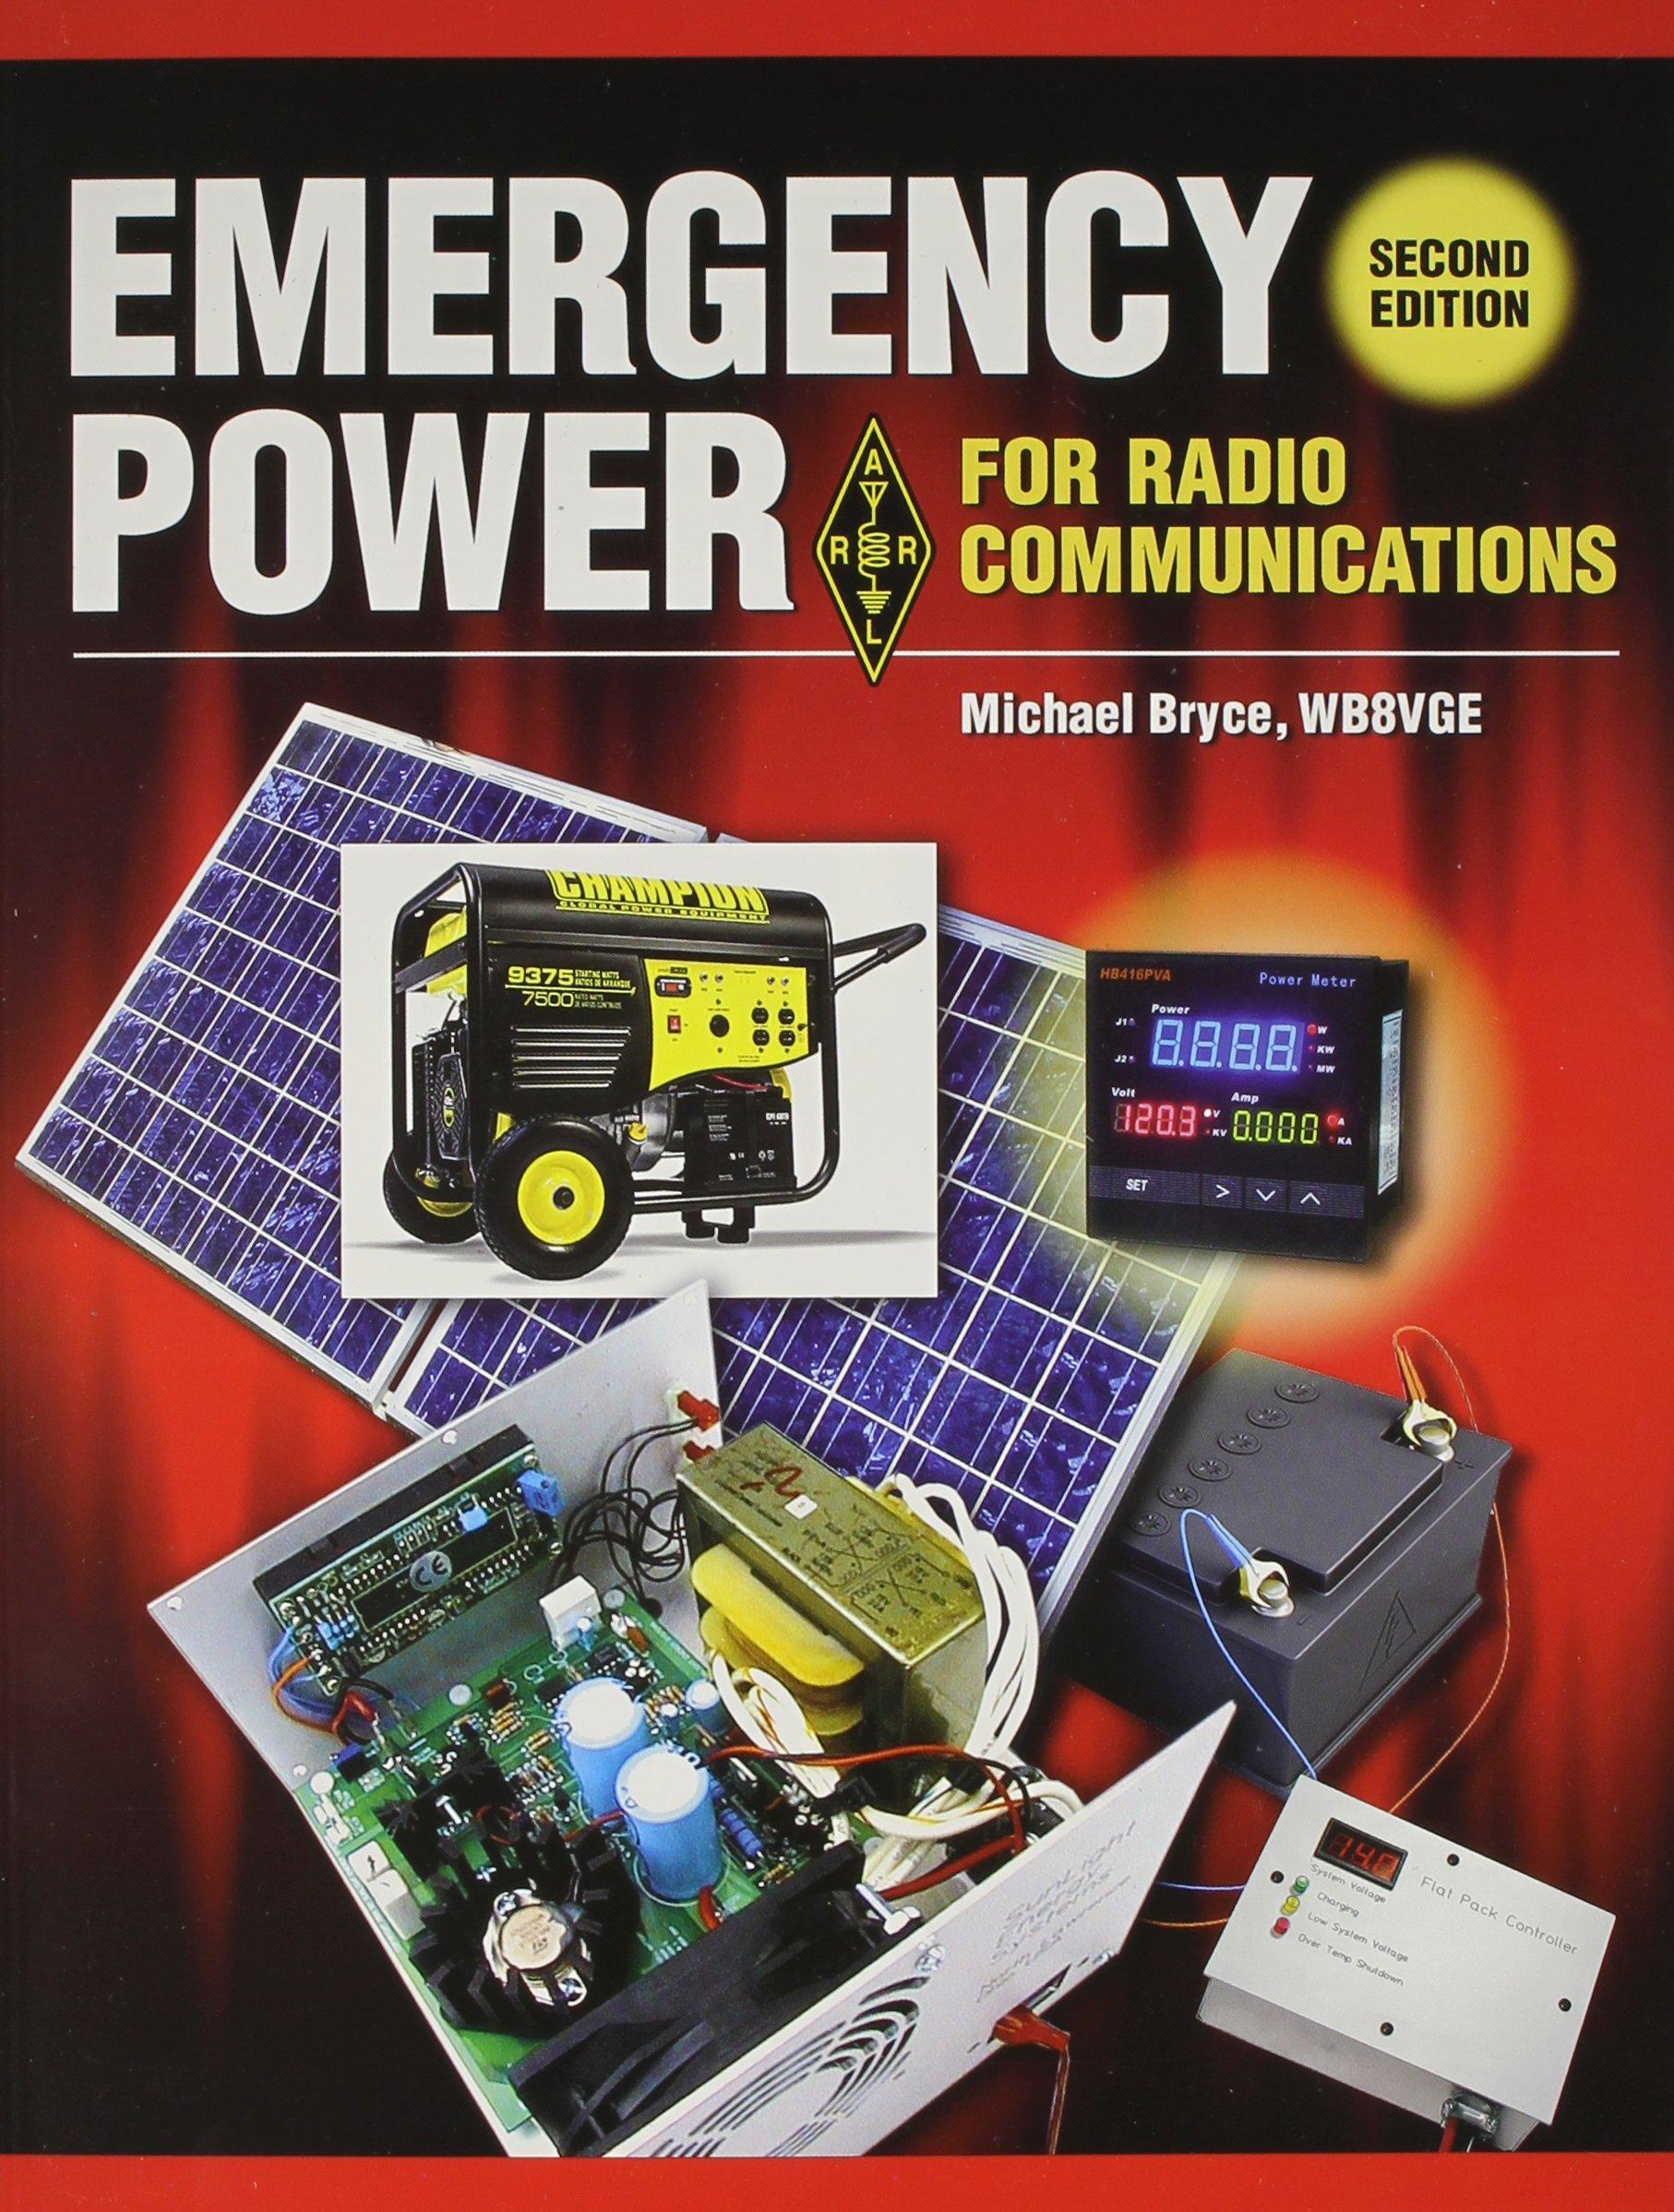 emergency power for radio communications 9780872596153 amazon comemergency power for radio communications paperback \u2013 april 26, 2012